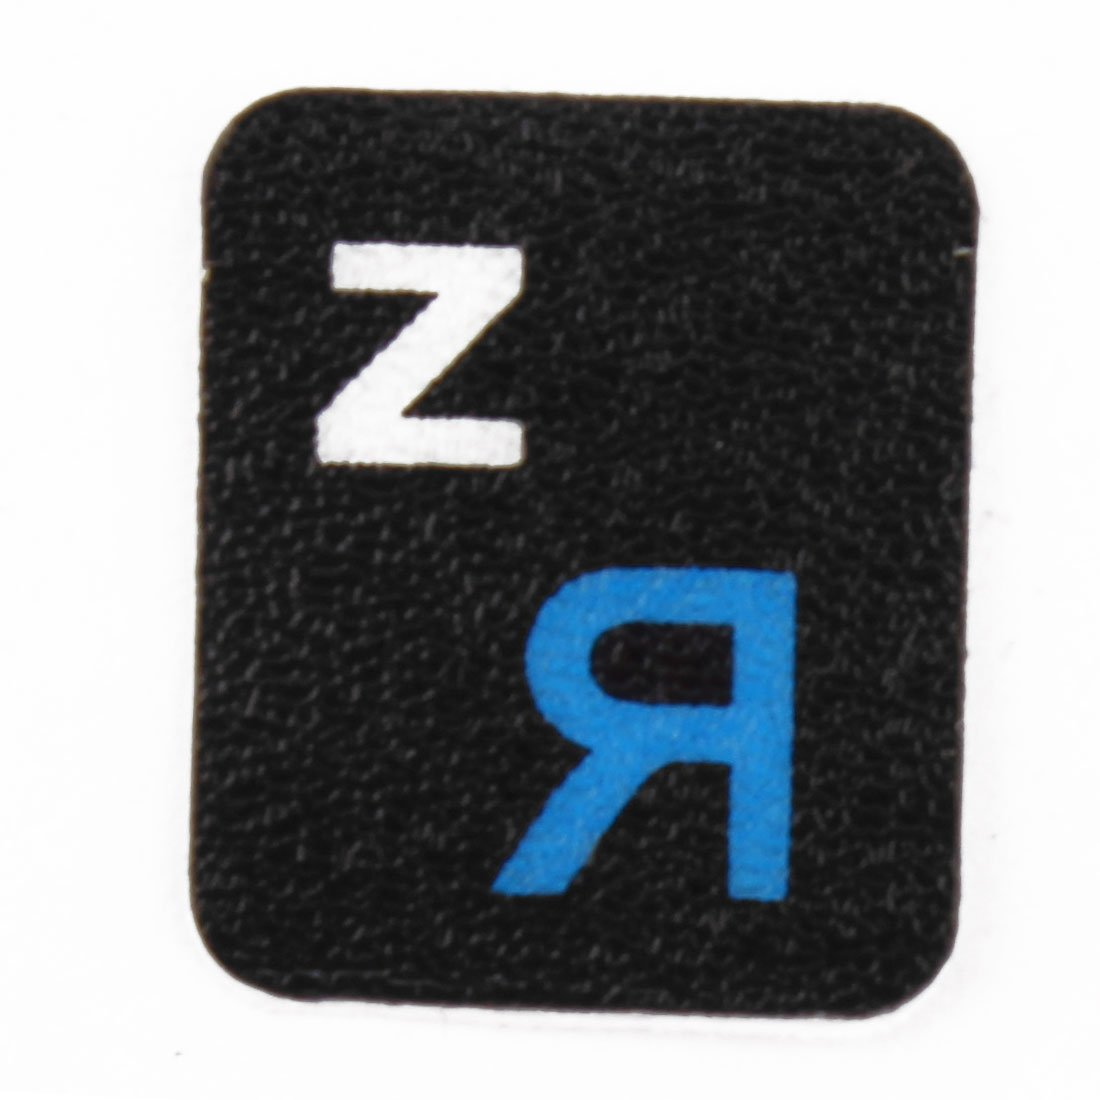 Sourcingmap Desktop Laptop Computer Russian Keyboard Decal Protector Large Letters Sticker Blue